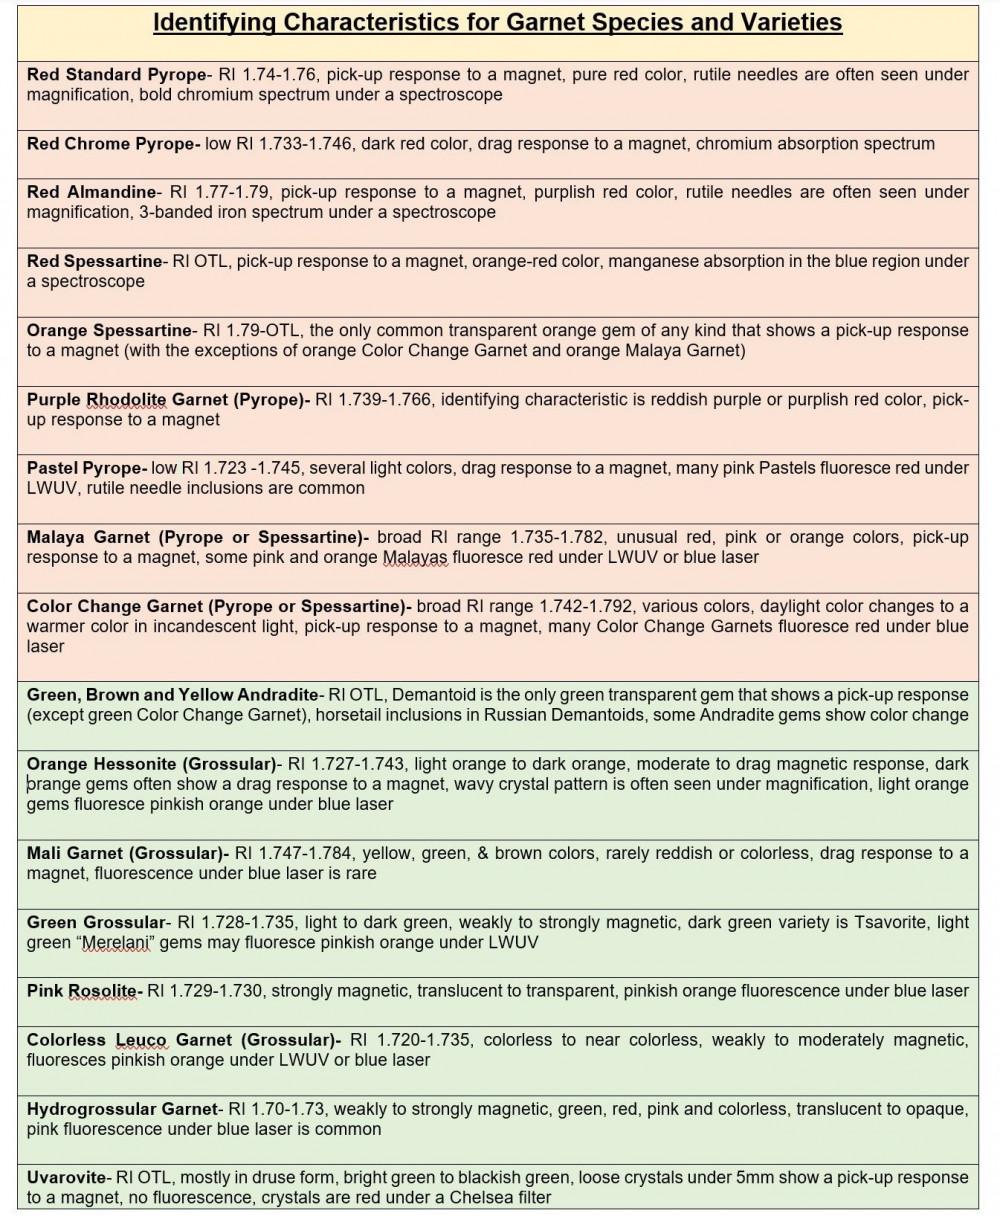 Distinguishing Between Garnet Species and Varieties